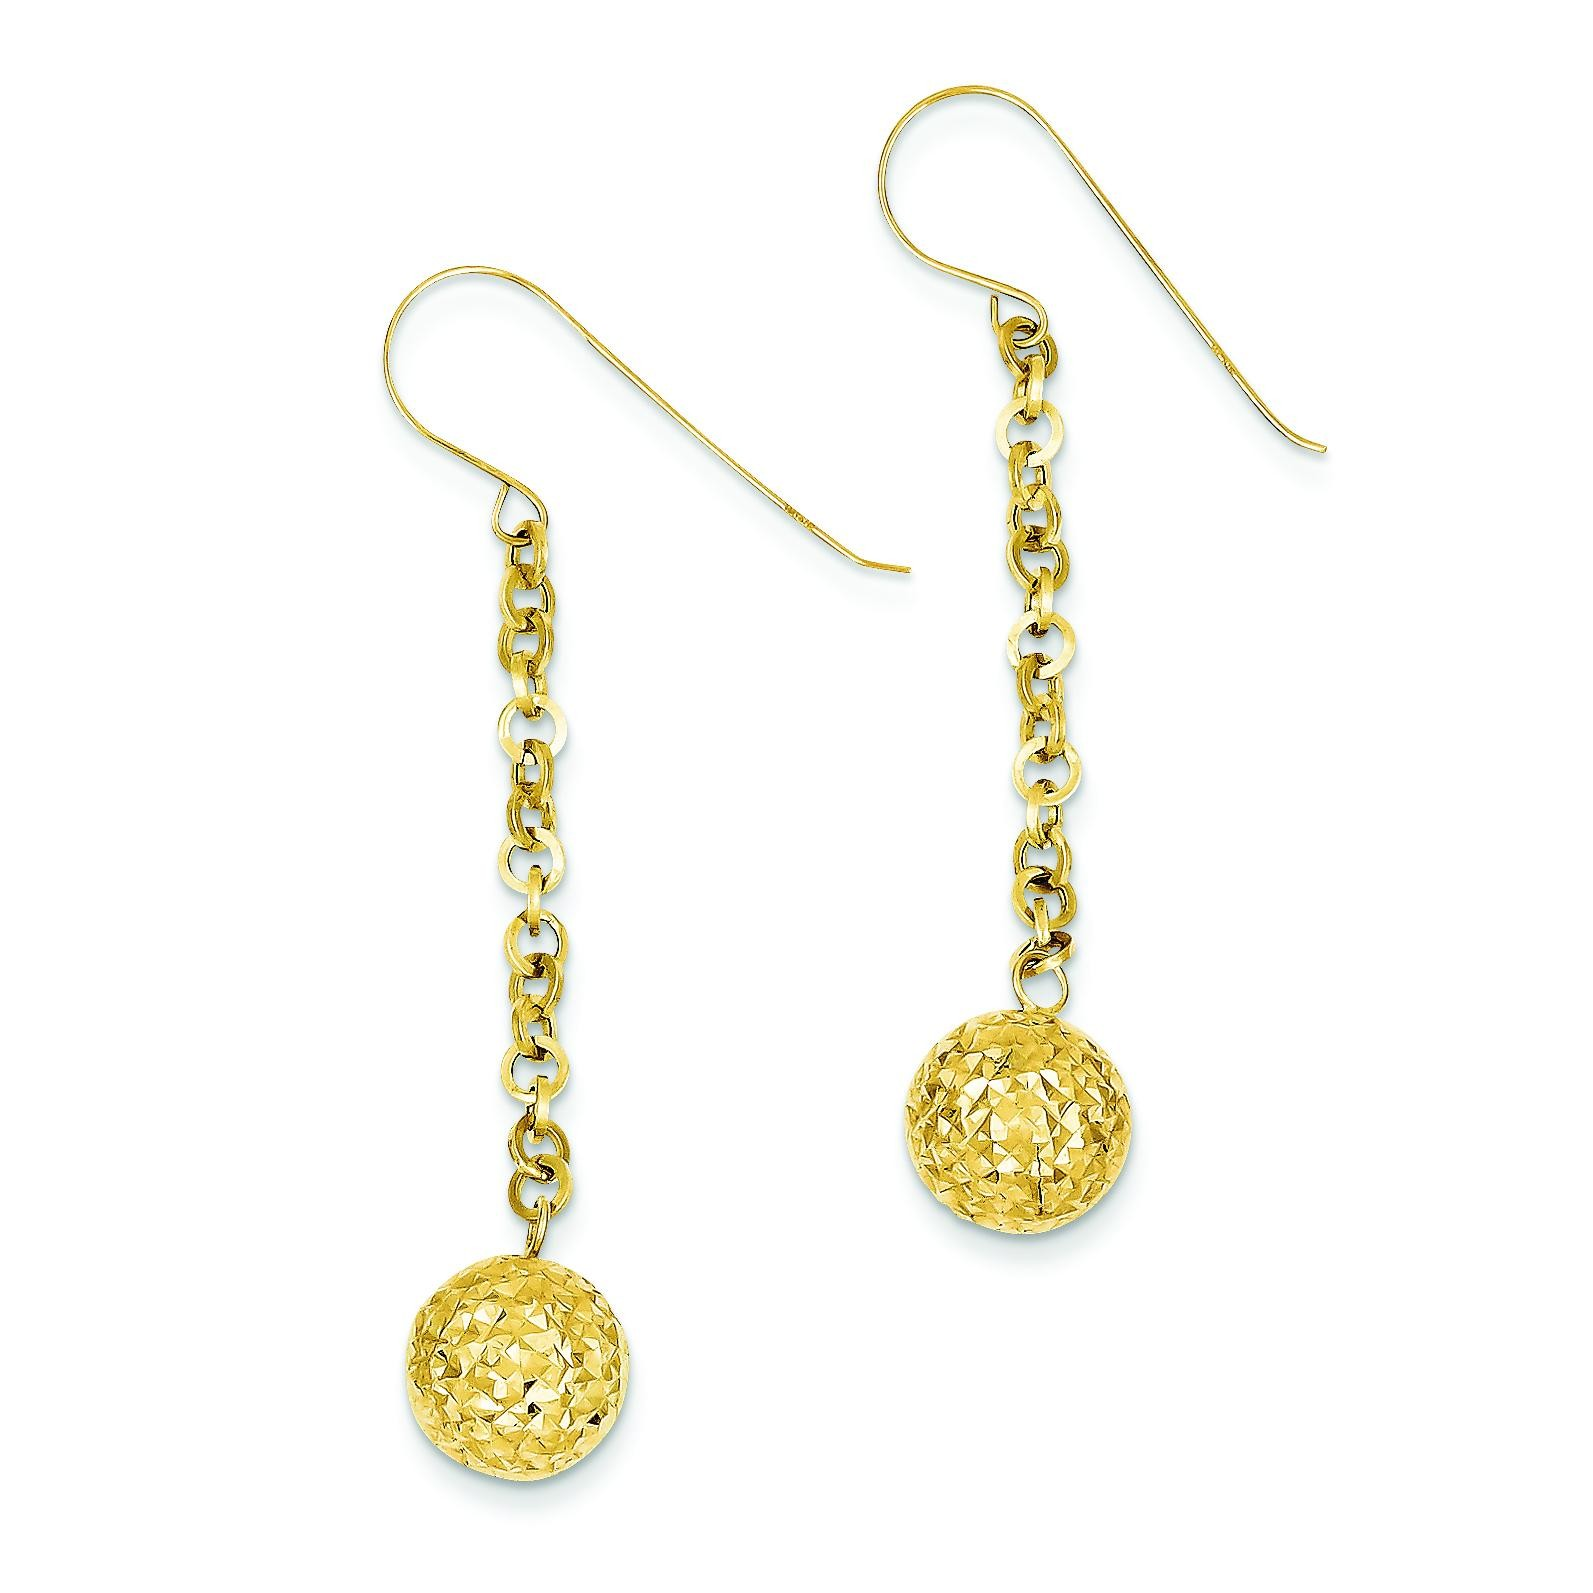 Diamond Cut Hollow Bead Dangle Earrings in 14k Yellow Gold